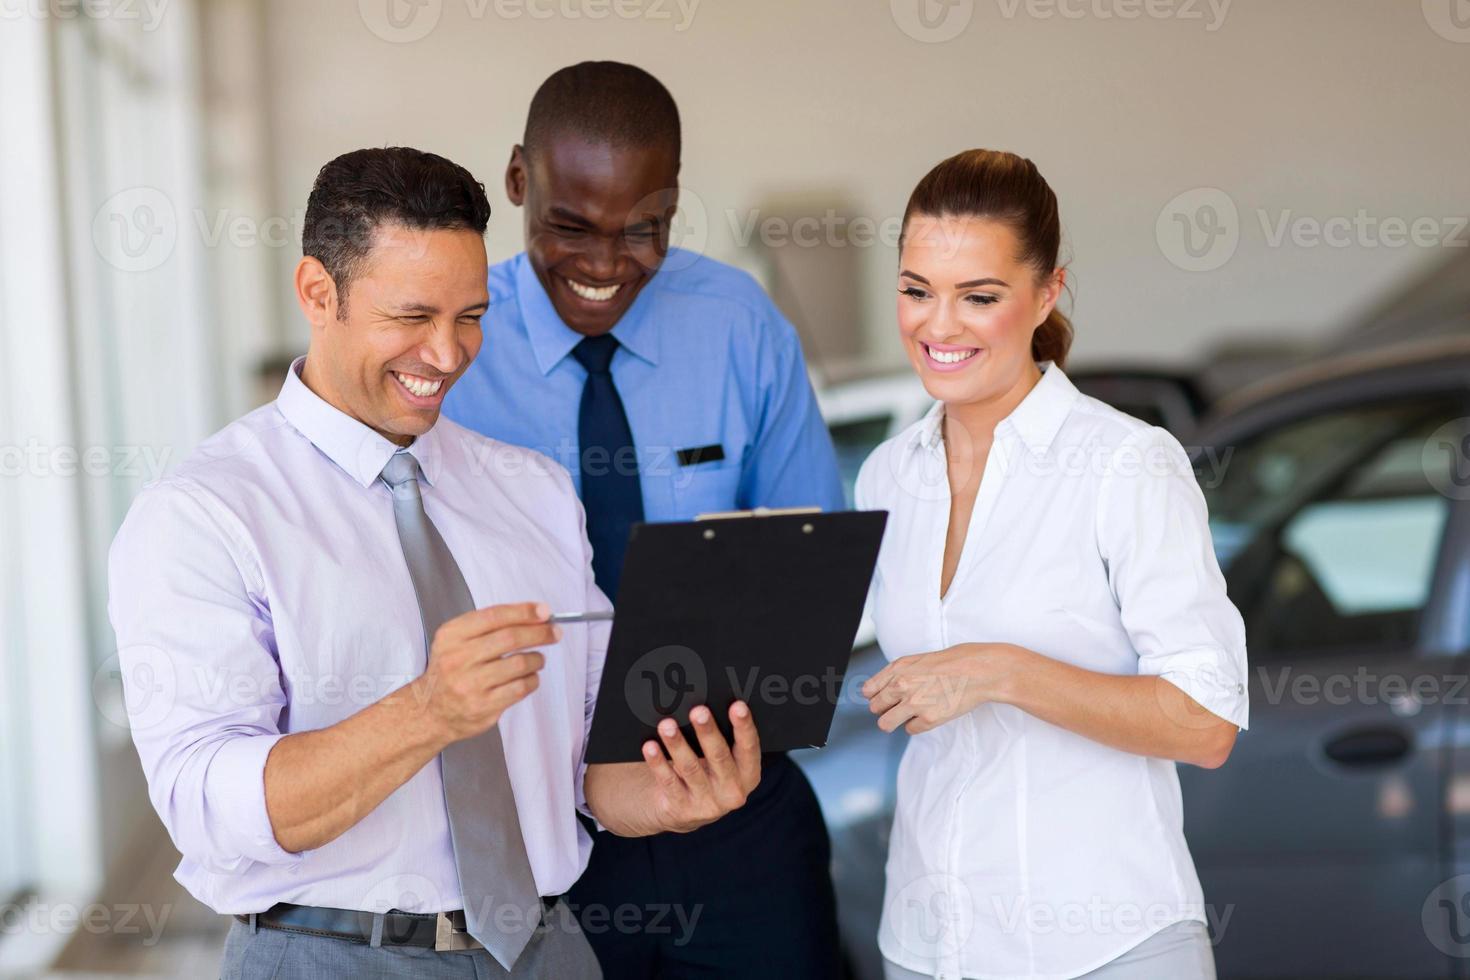 grupo de consultores de vendas de carros trabalhando dentro de showroom de veículos foto